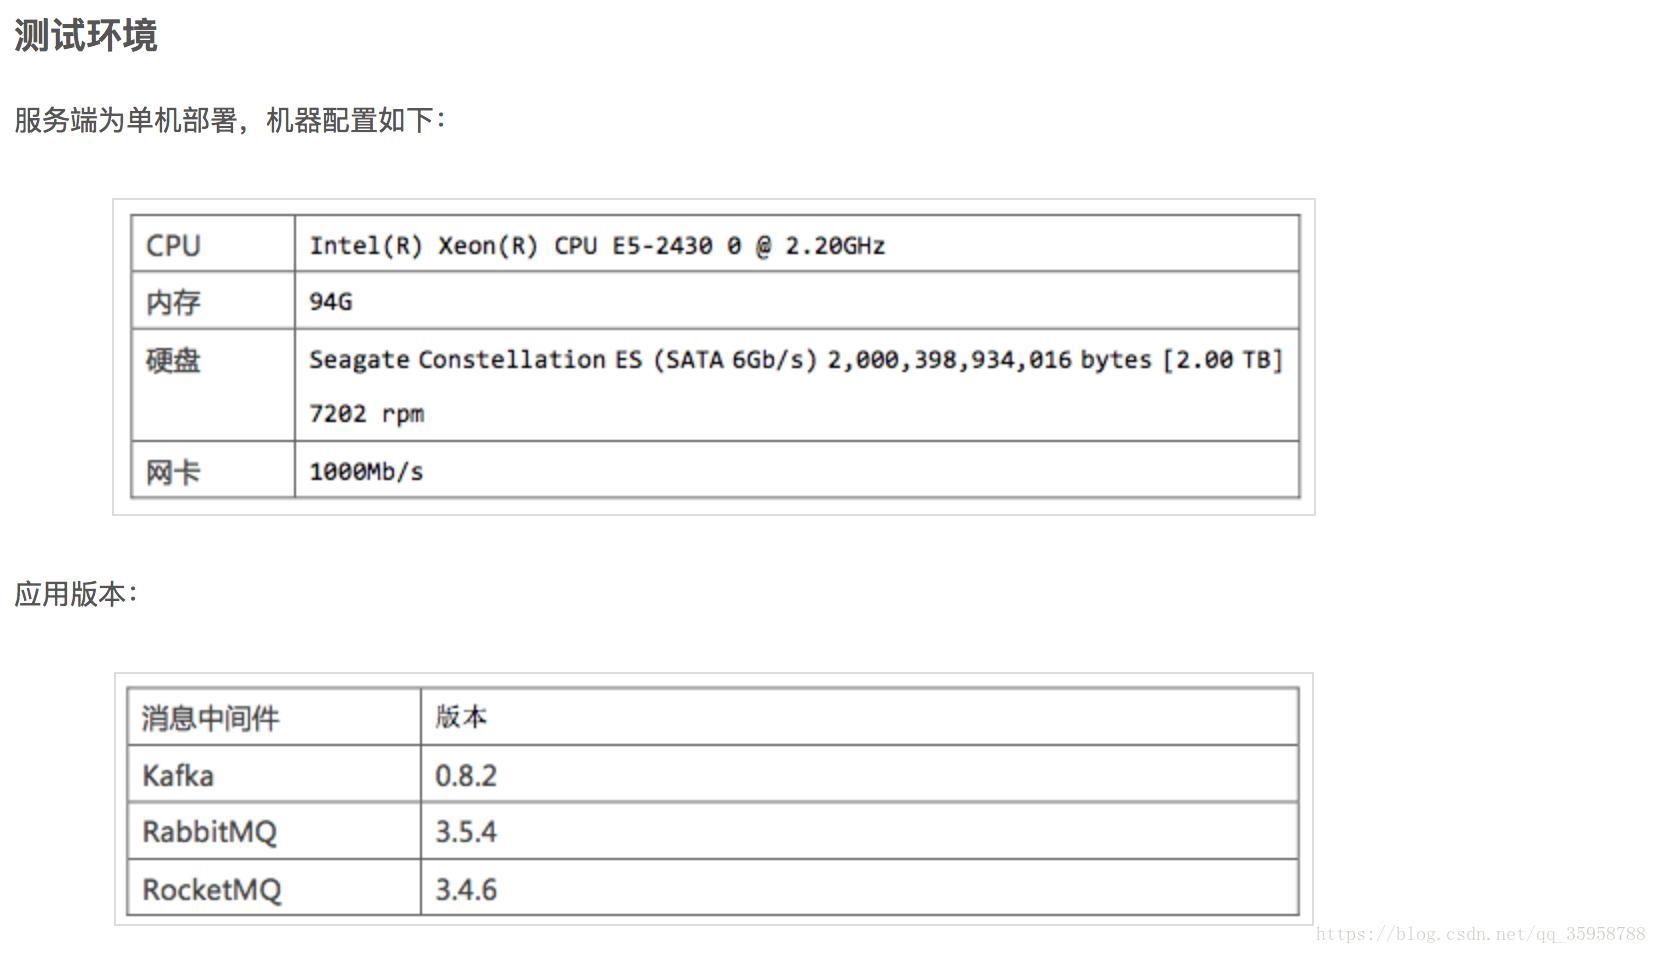 Comparison of message middleware such as Kafka, RabbitMQ, RocketMQ